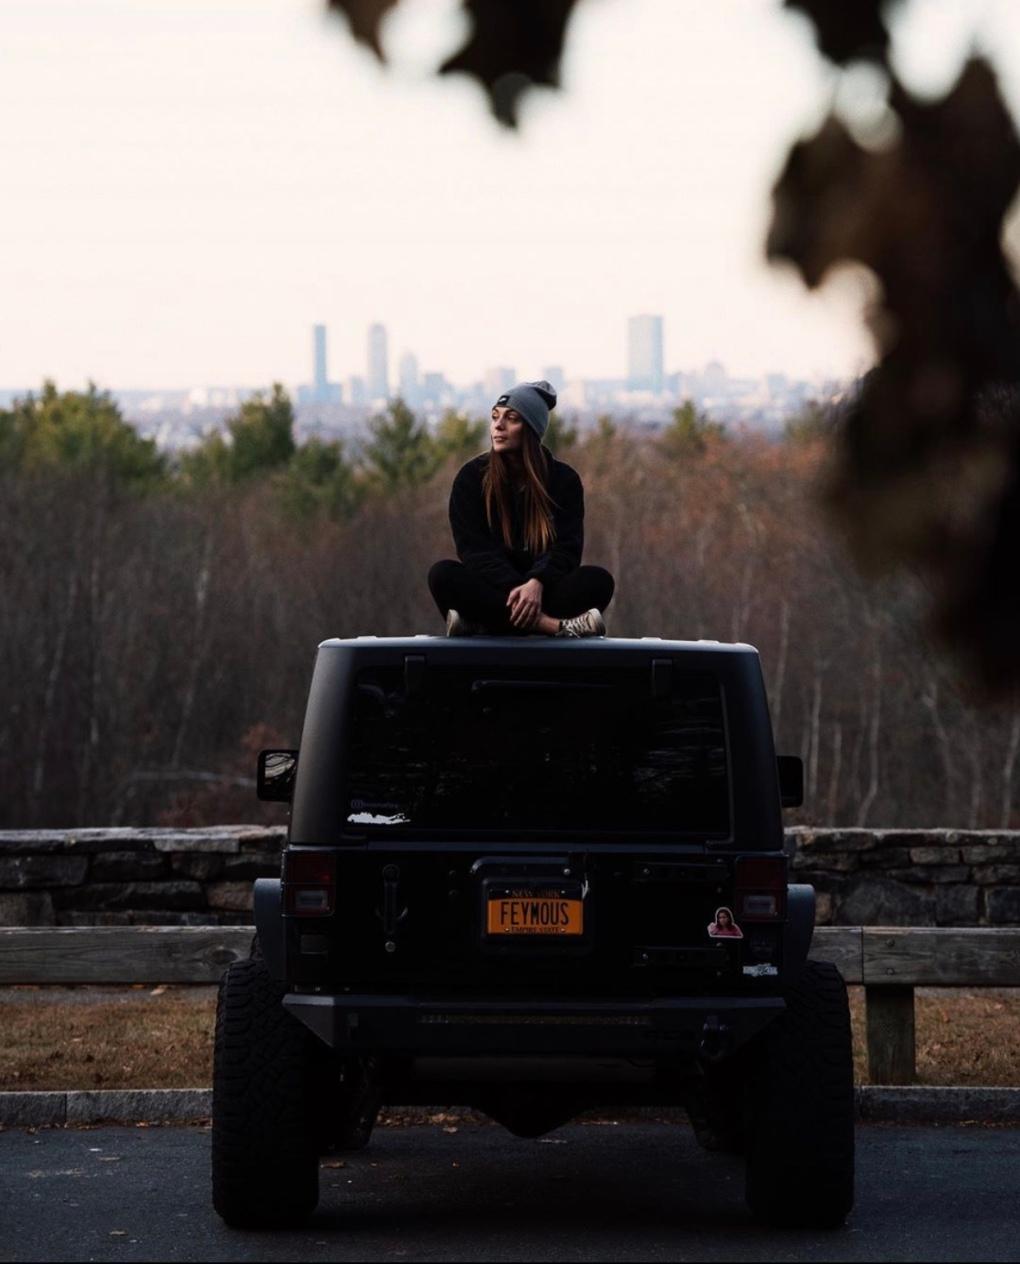 Black Jeep Wrangler in Blue Hills State Park in Massachusetts. Boston, Massachusetts is visible in the background.